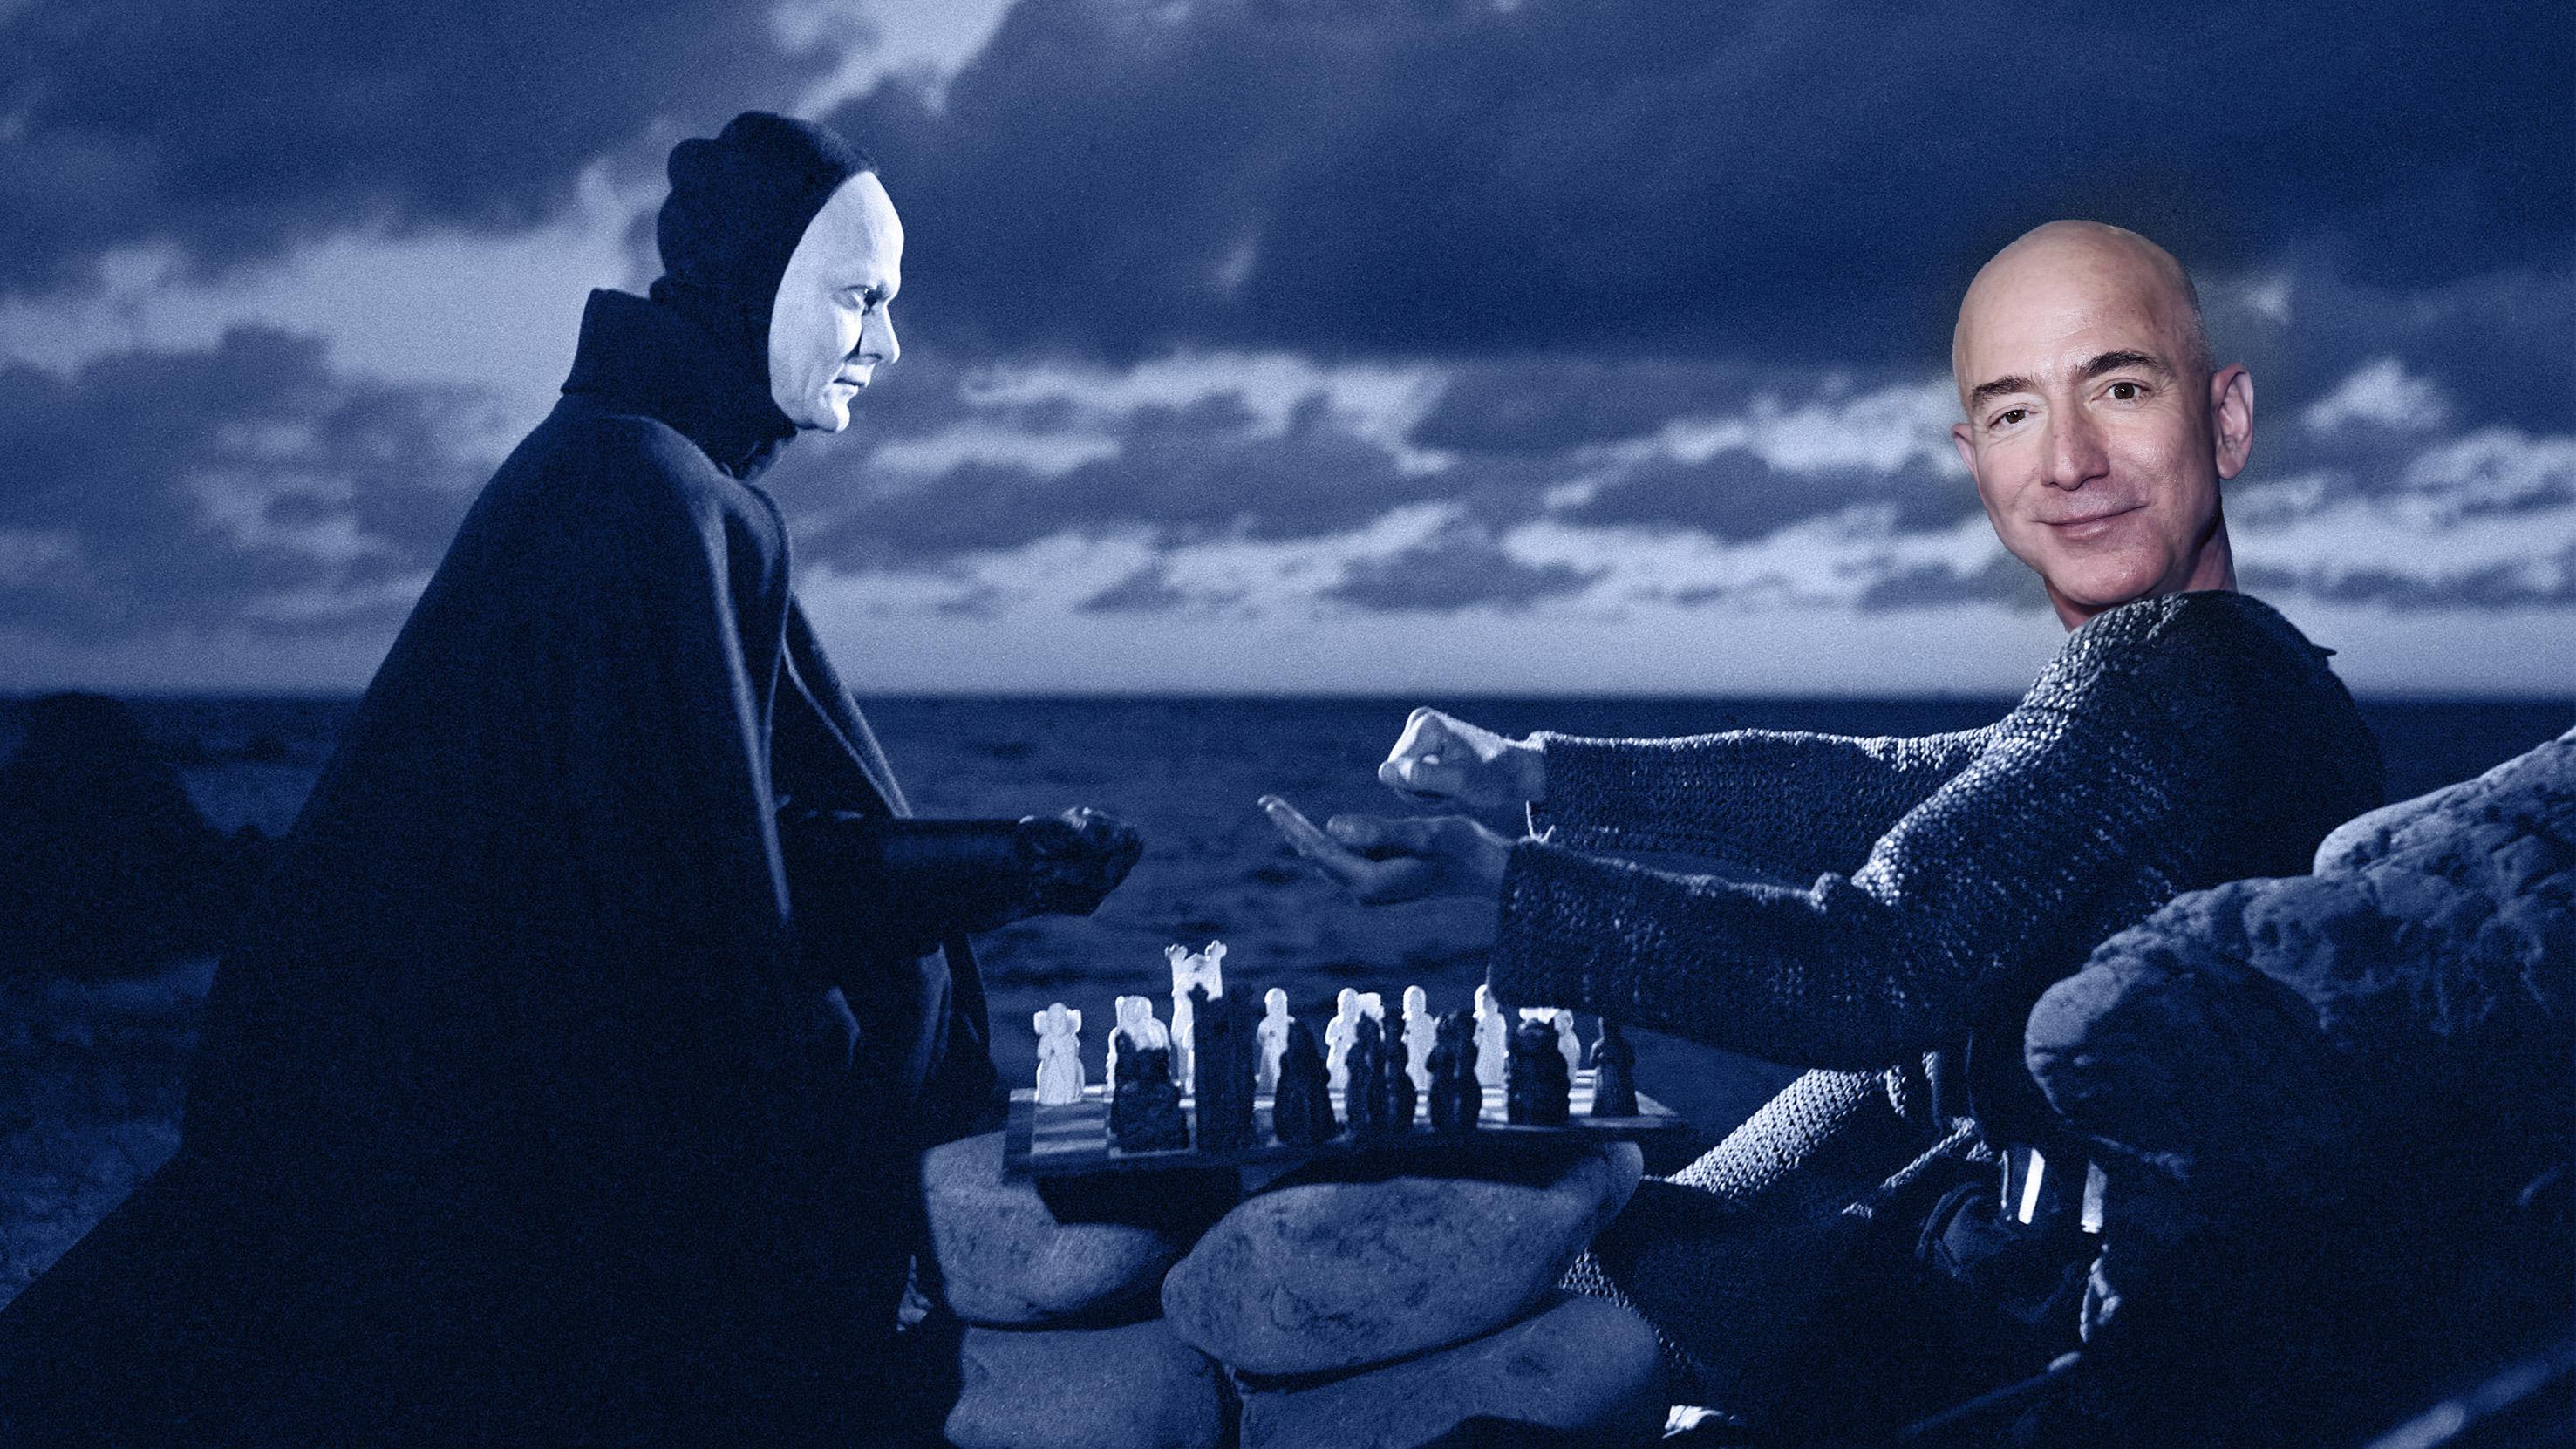 Death and Jeff Bezos